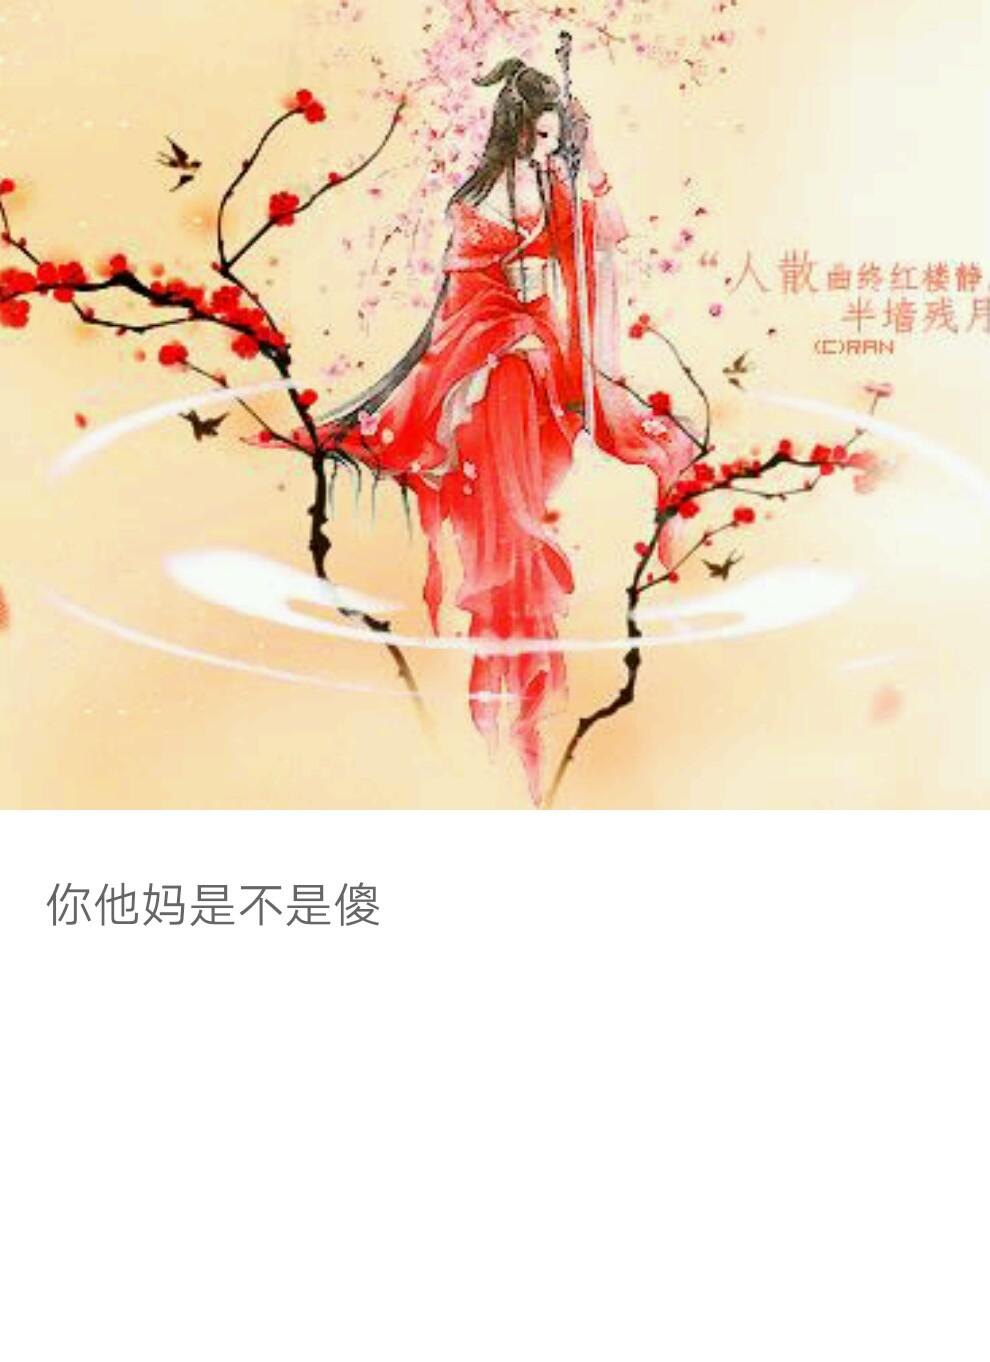 http://www.elycia-webdesign.com/pid/643511.html